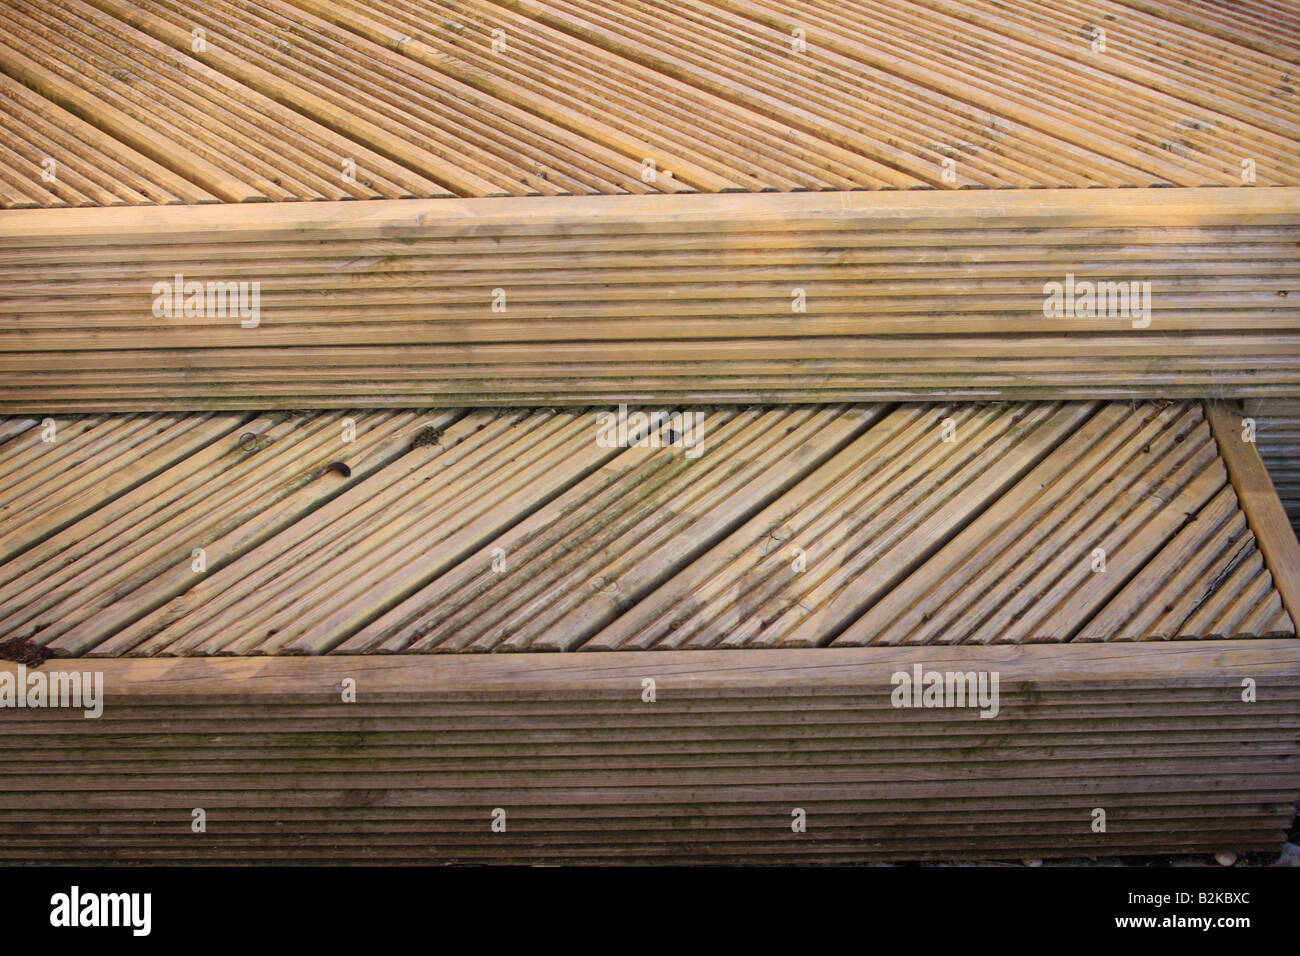 Holzdielen Terrasse Terrasse Bambus Atemberaubend